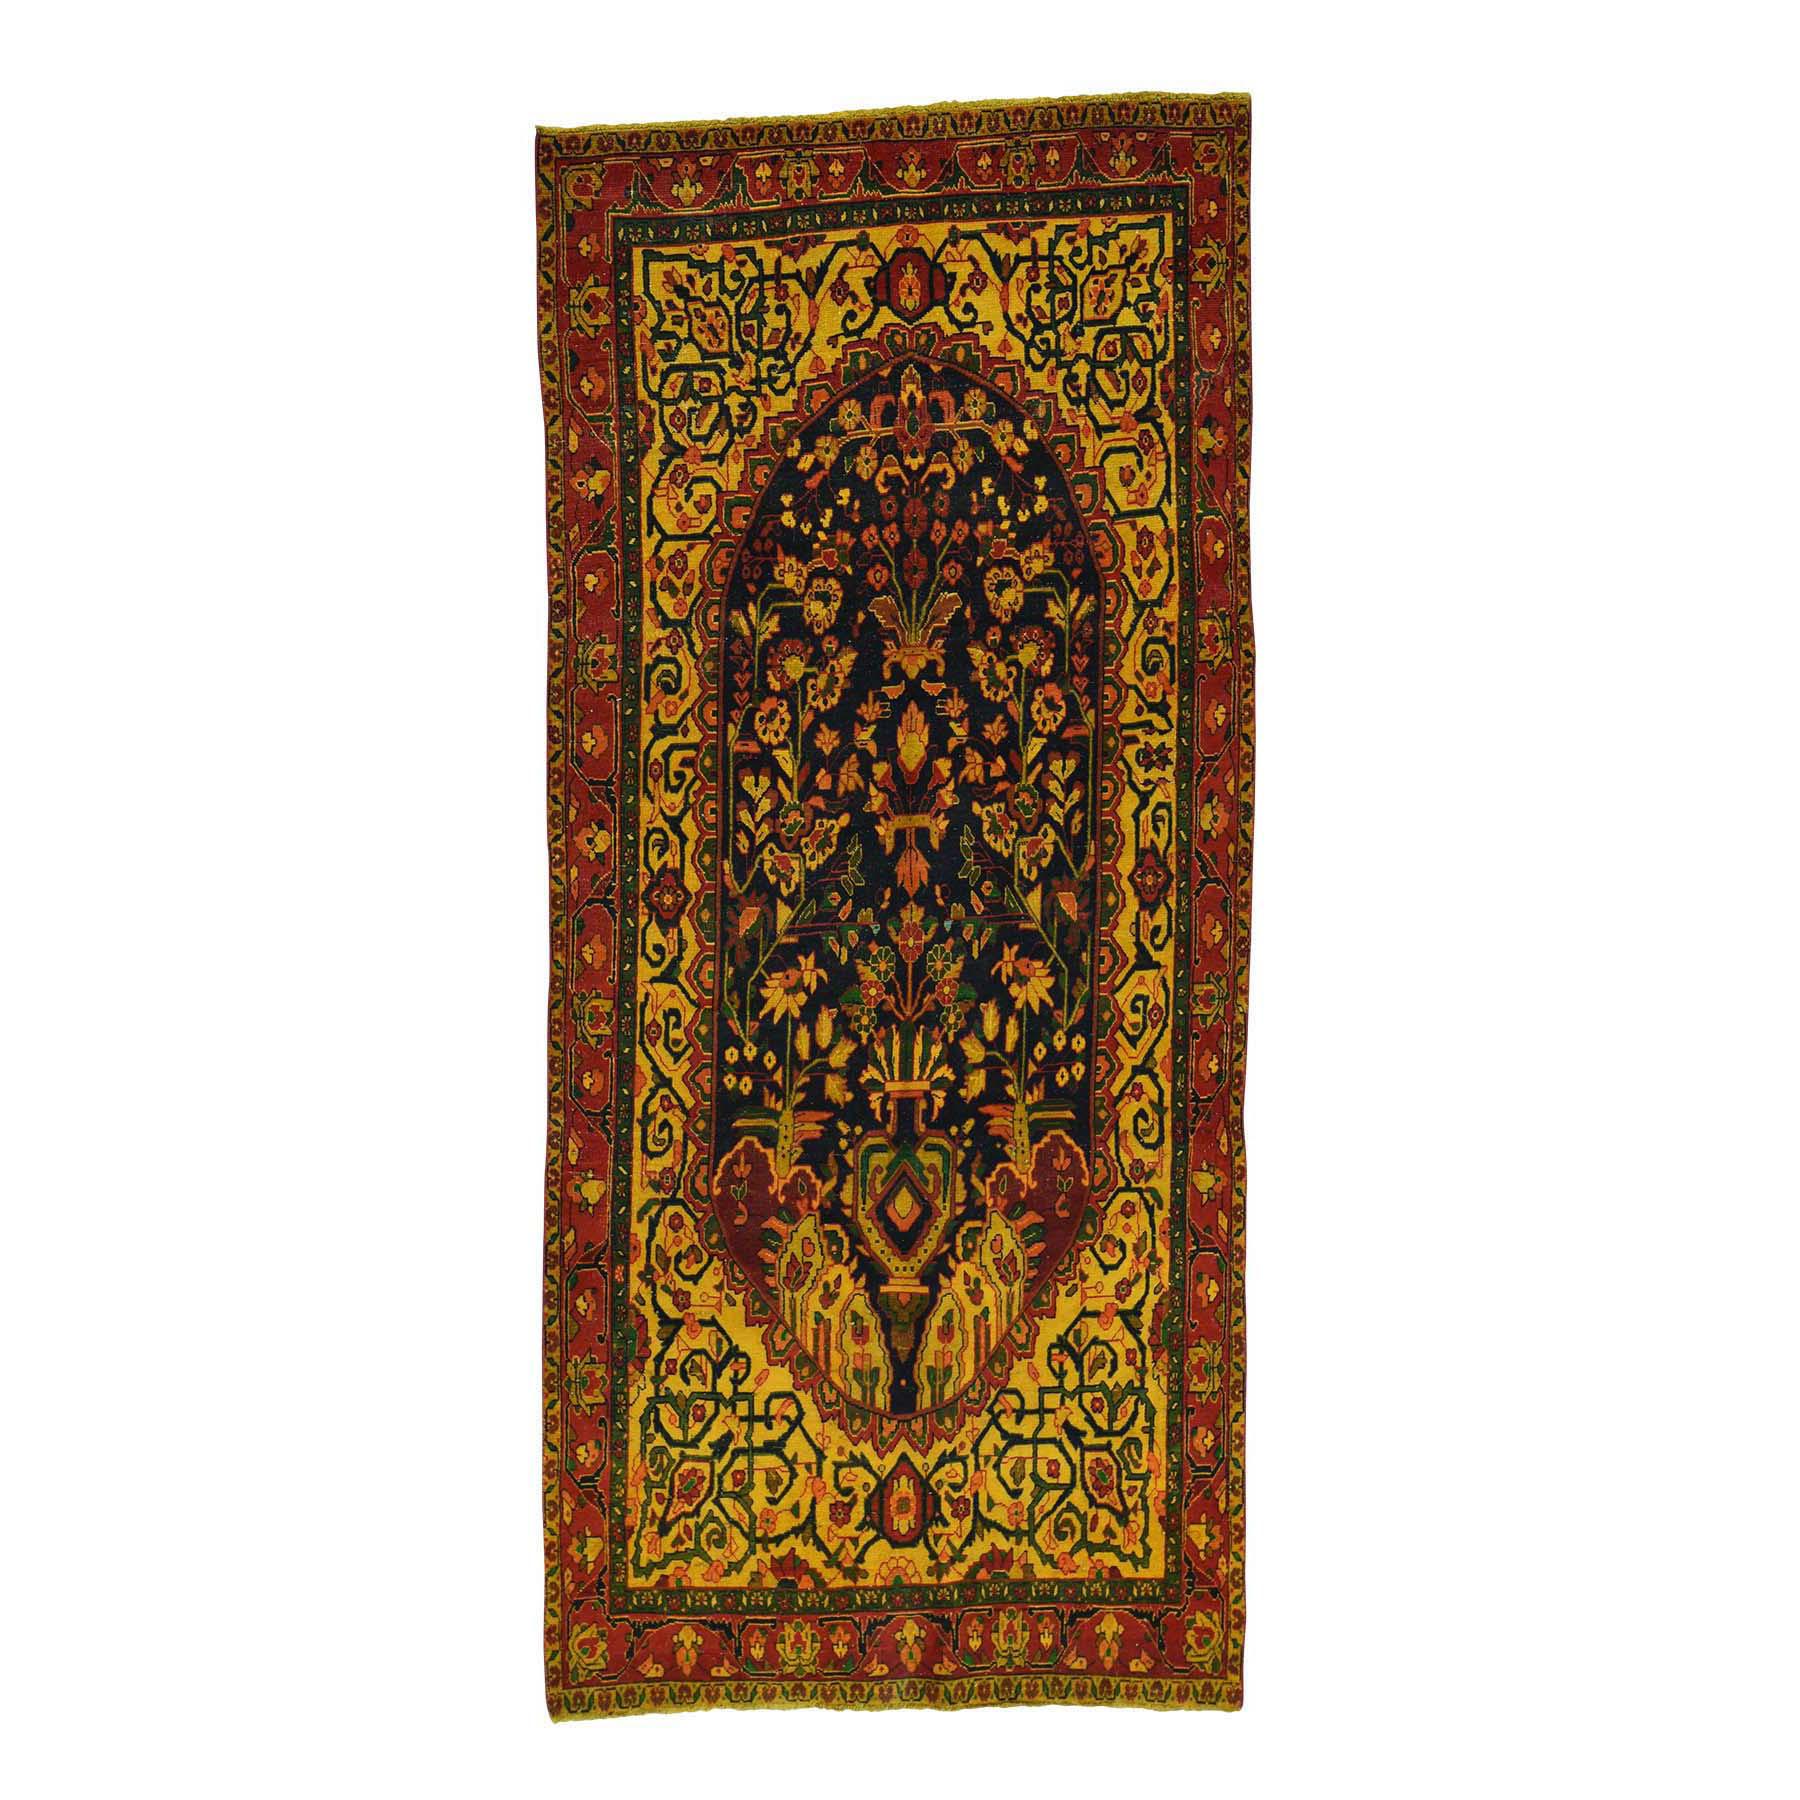 "4'6""X10'3"" Handmade Overdyed Persian Bakhtiari Vintage Wide Runner Rug moacd8c8"